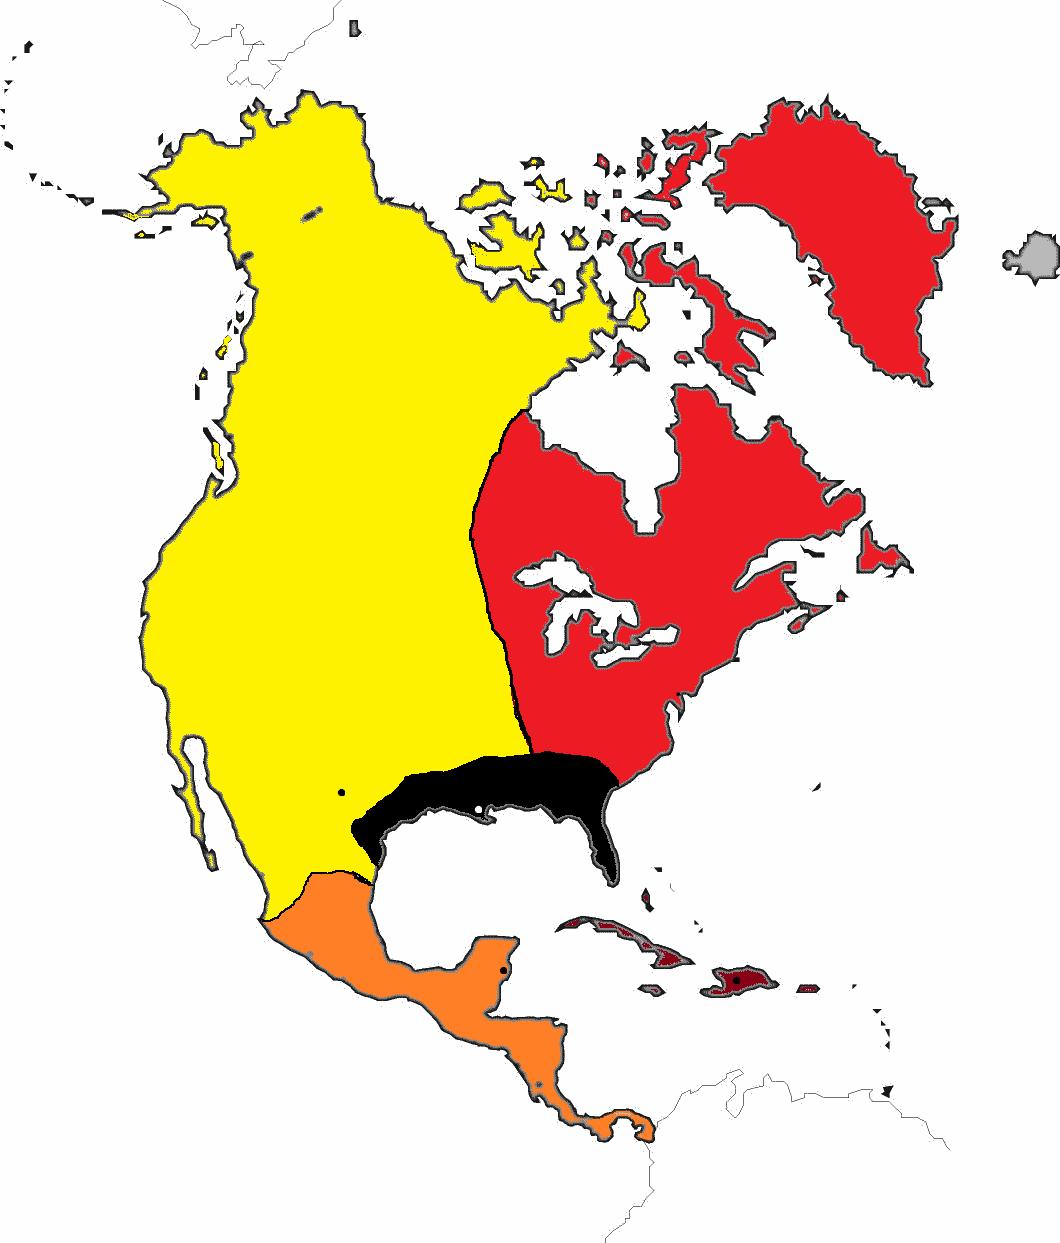 Image Blankmapnorthamericapng Alternative History FANDOM - North america map blank